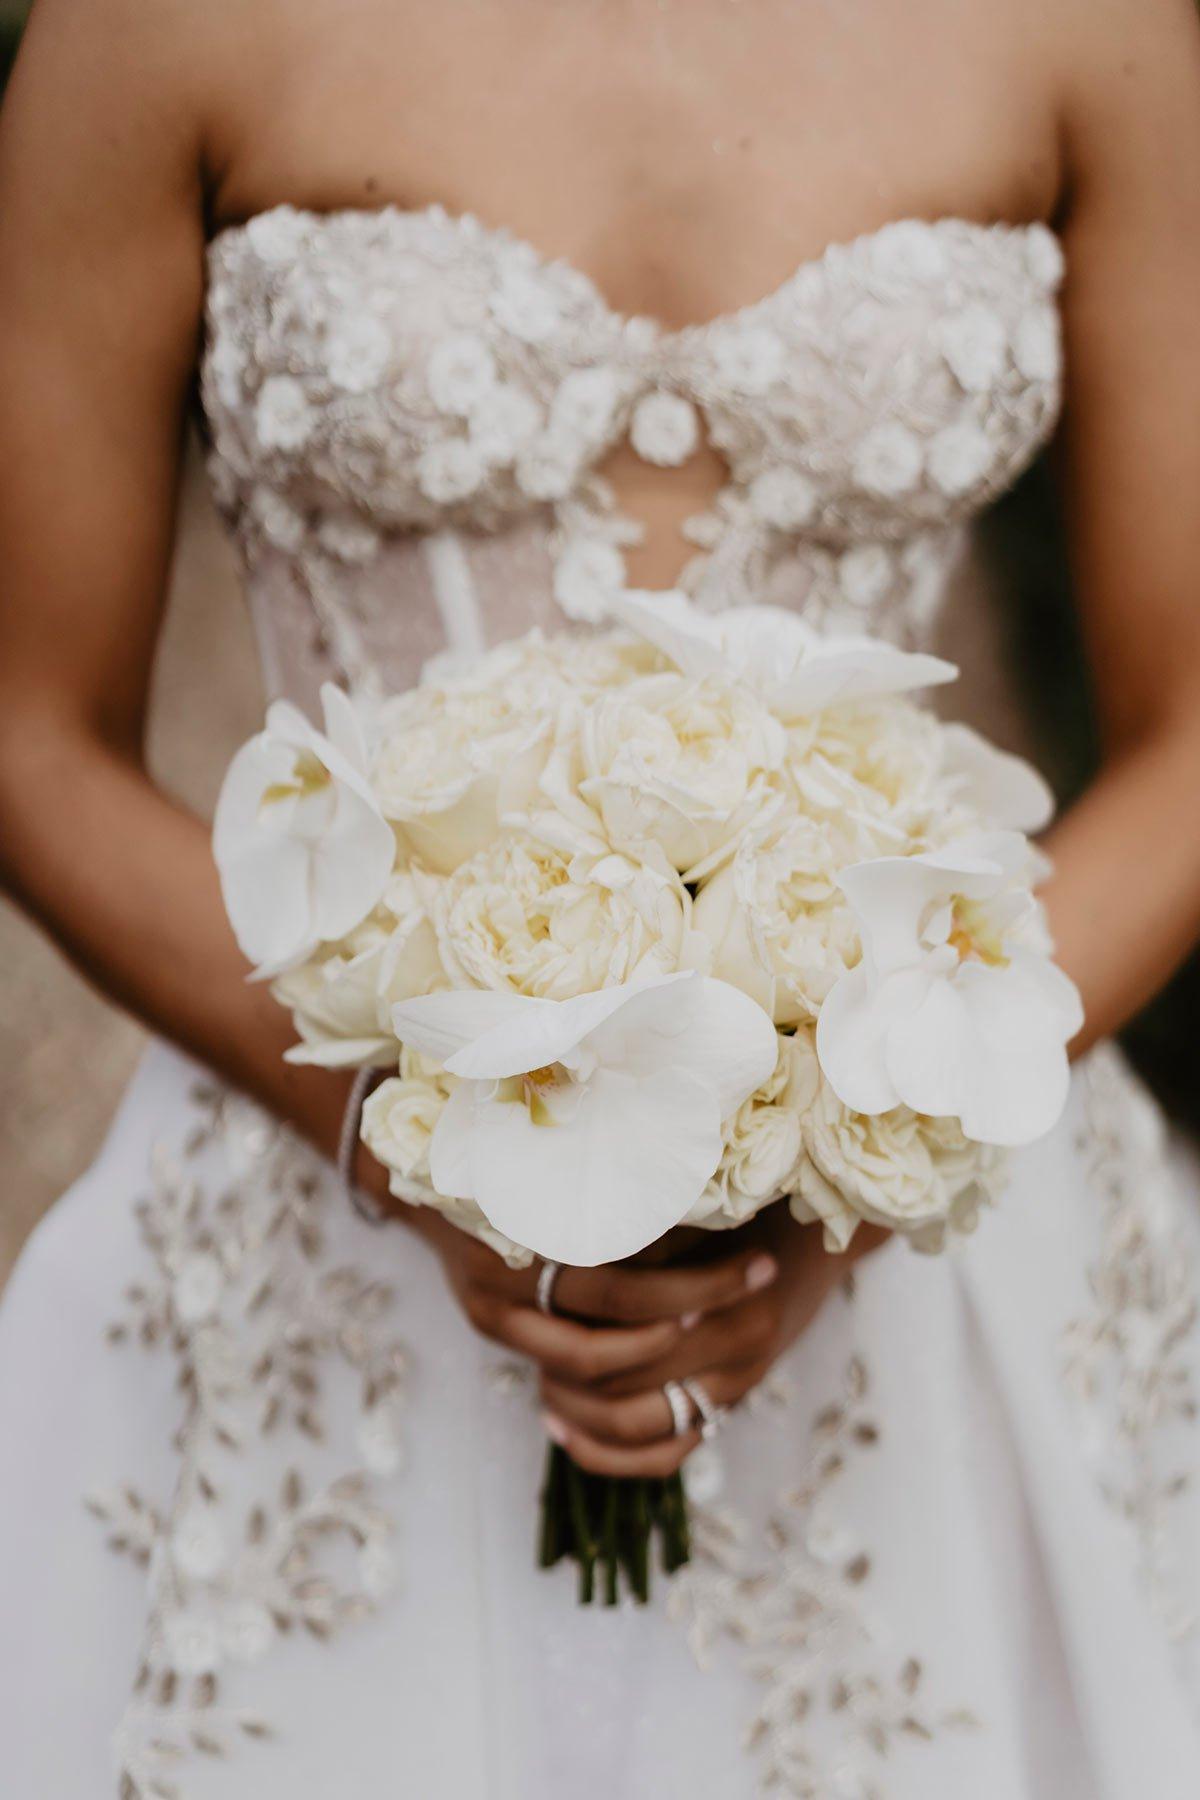 Ranya and Tarek, the bride white bouquet